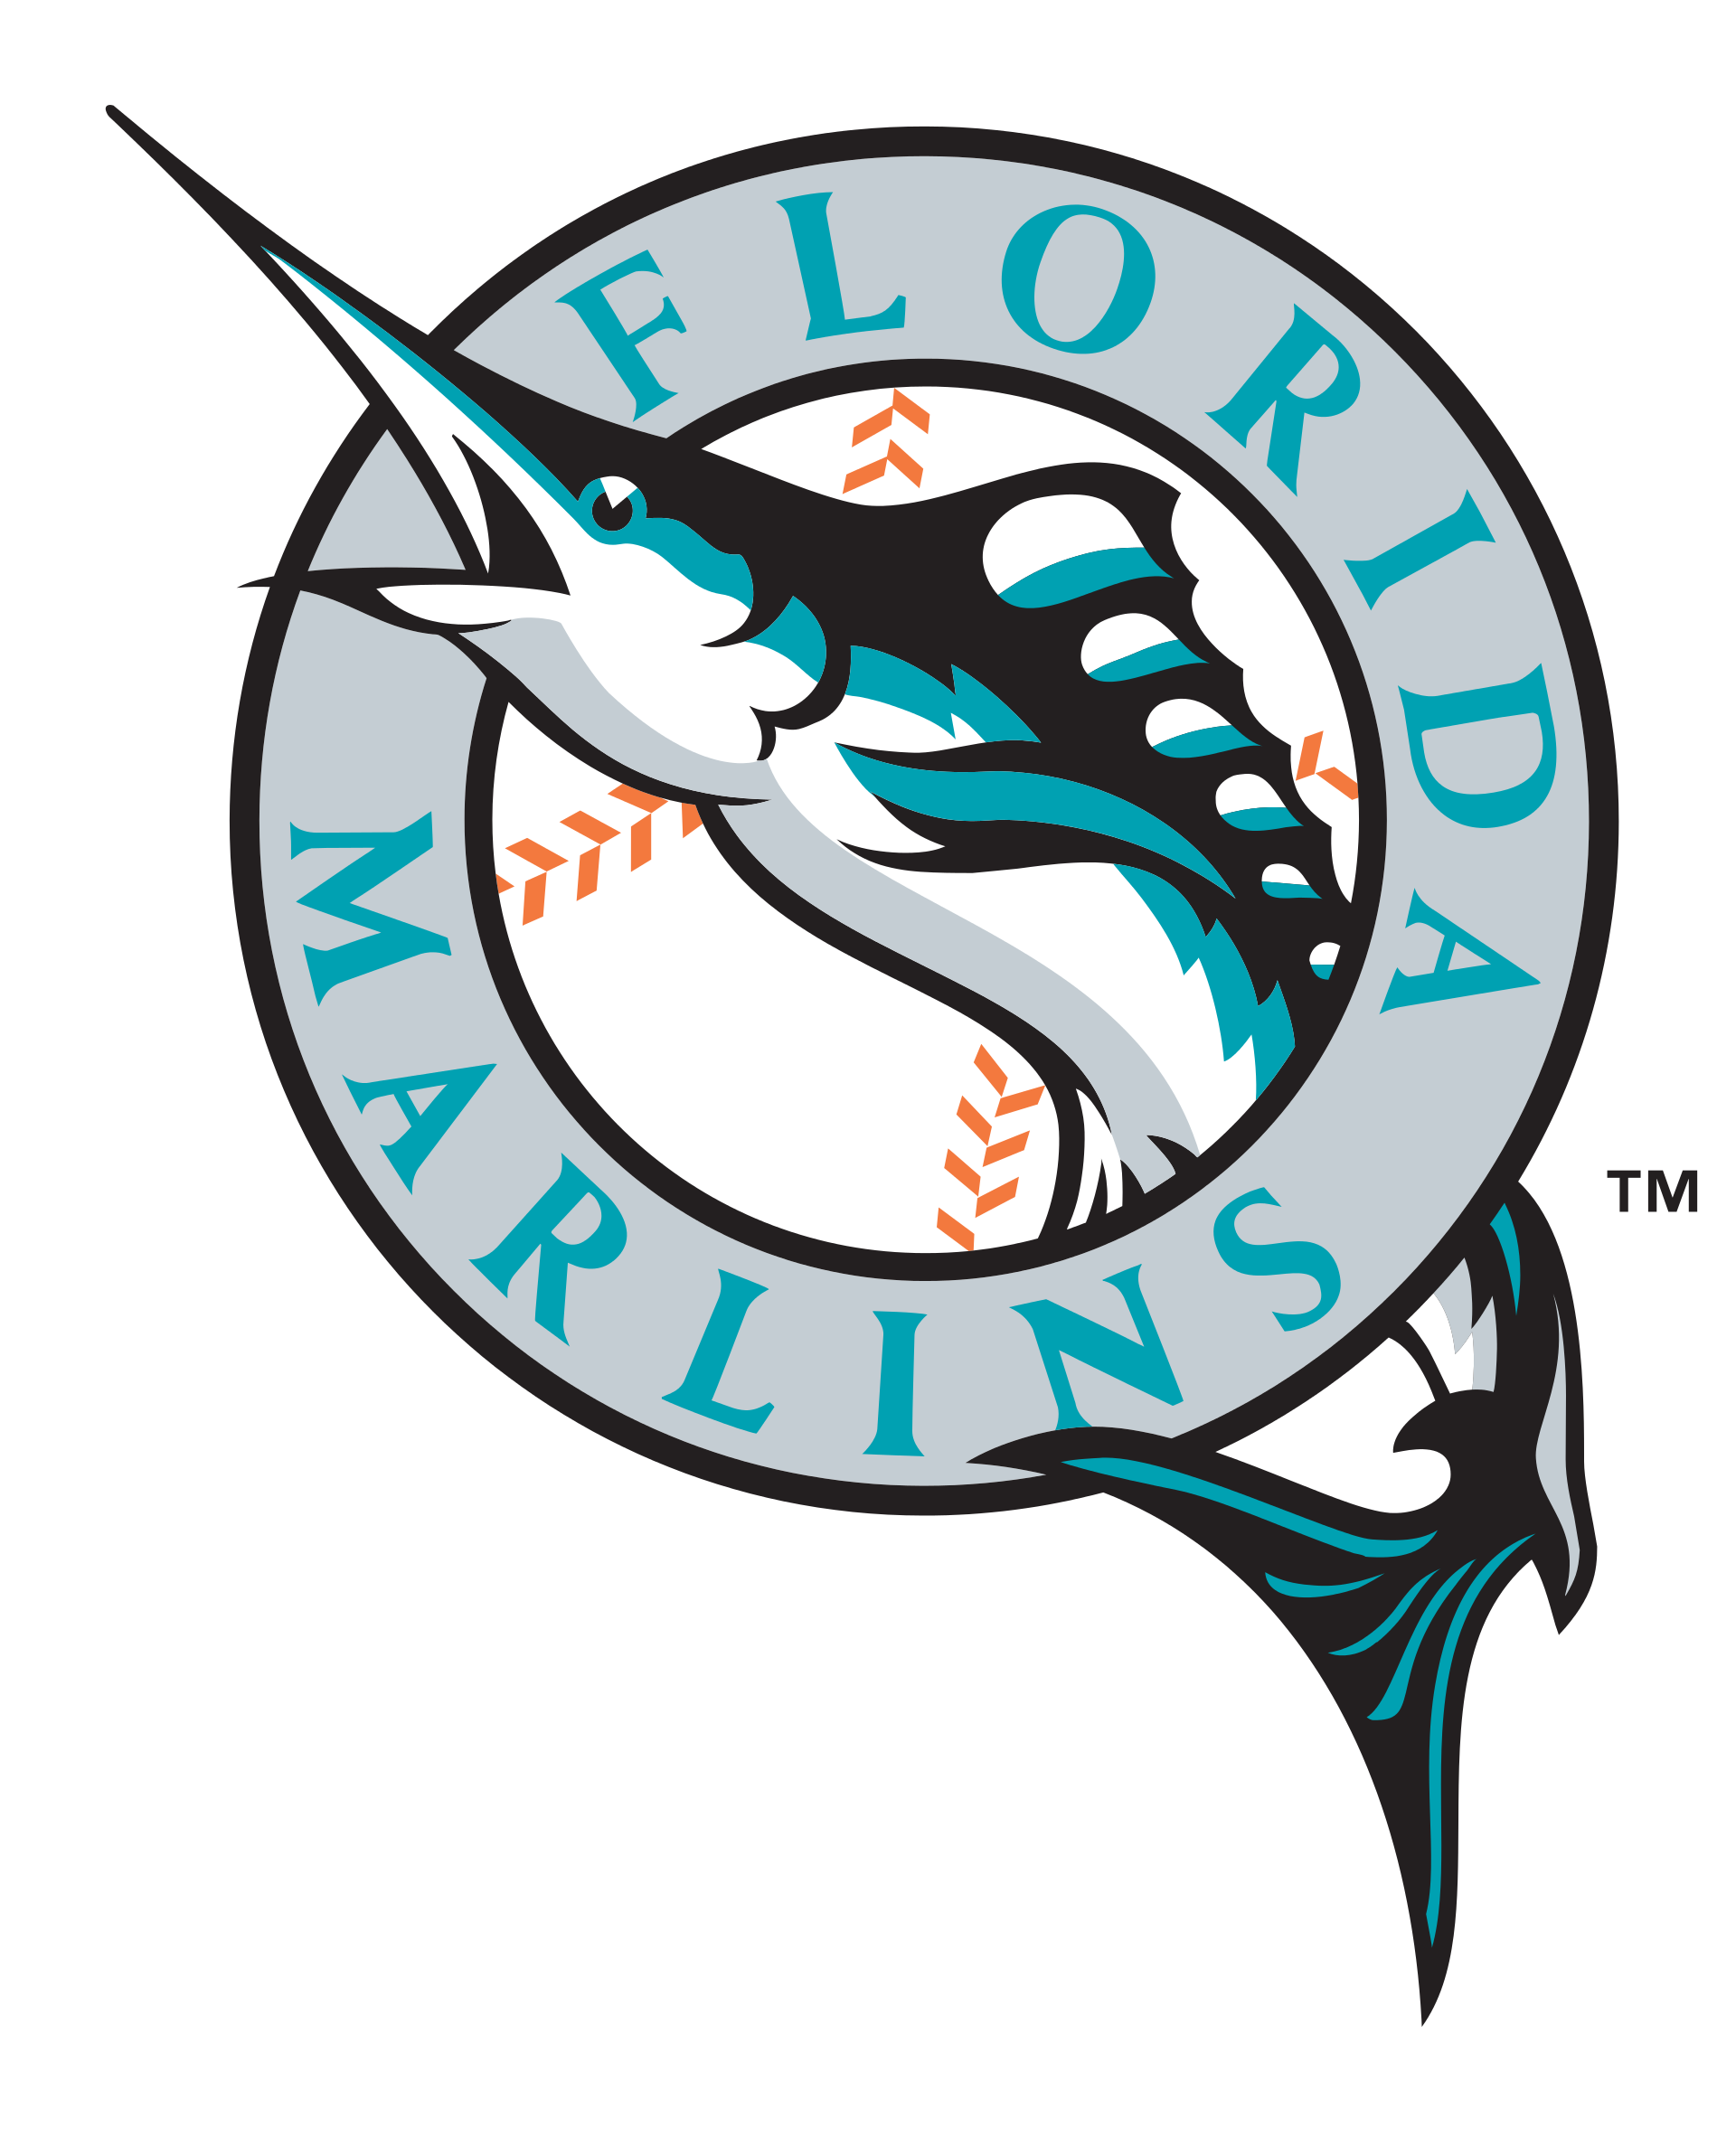 Miami marlins baseball jersey clipart svg download Marlins Logos svg download